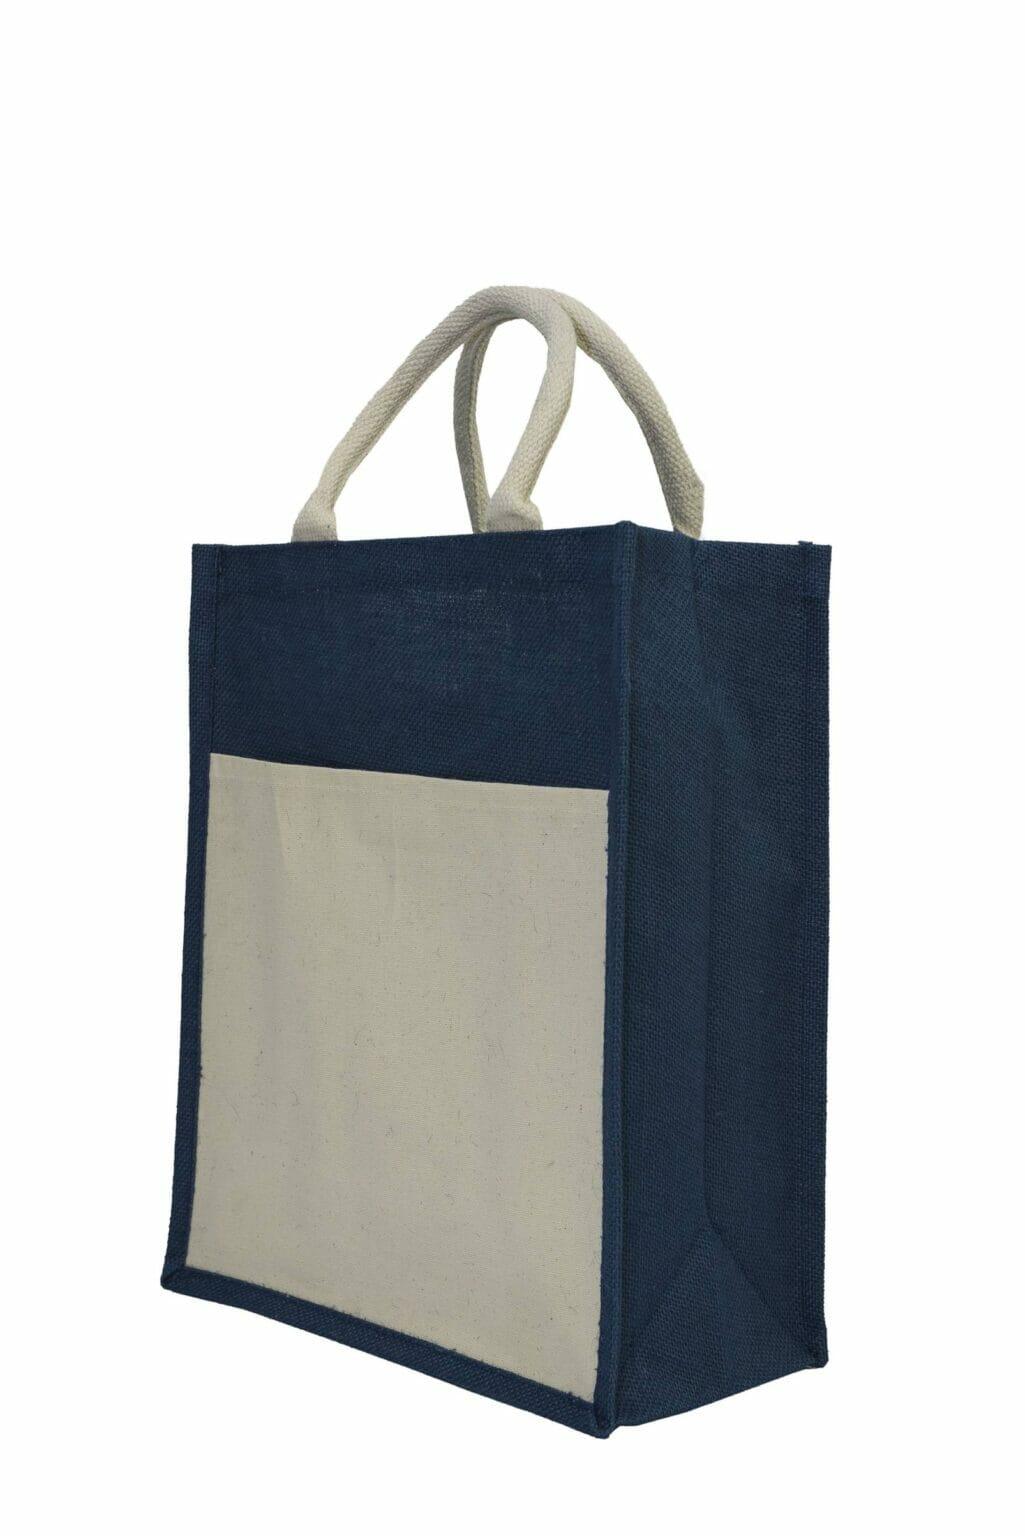 Jute Bag A4